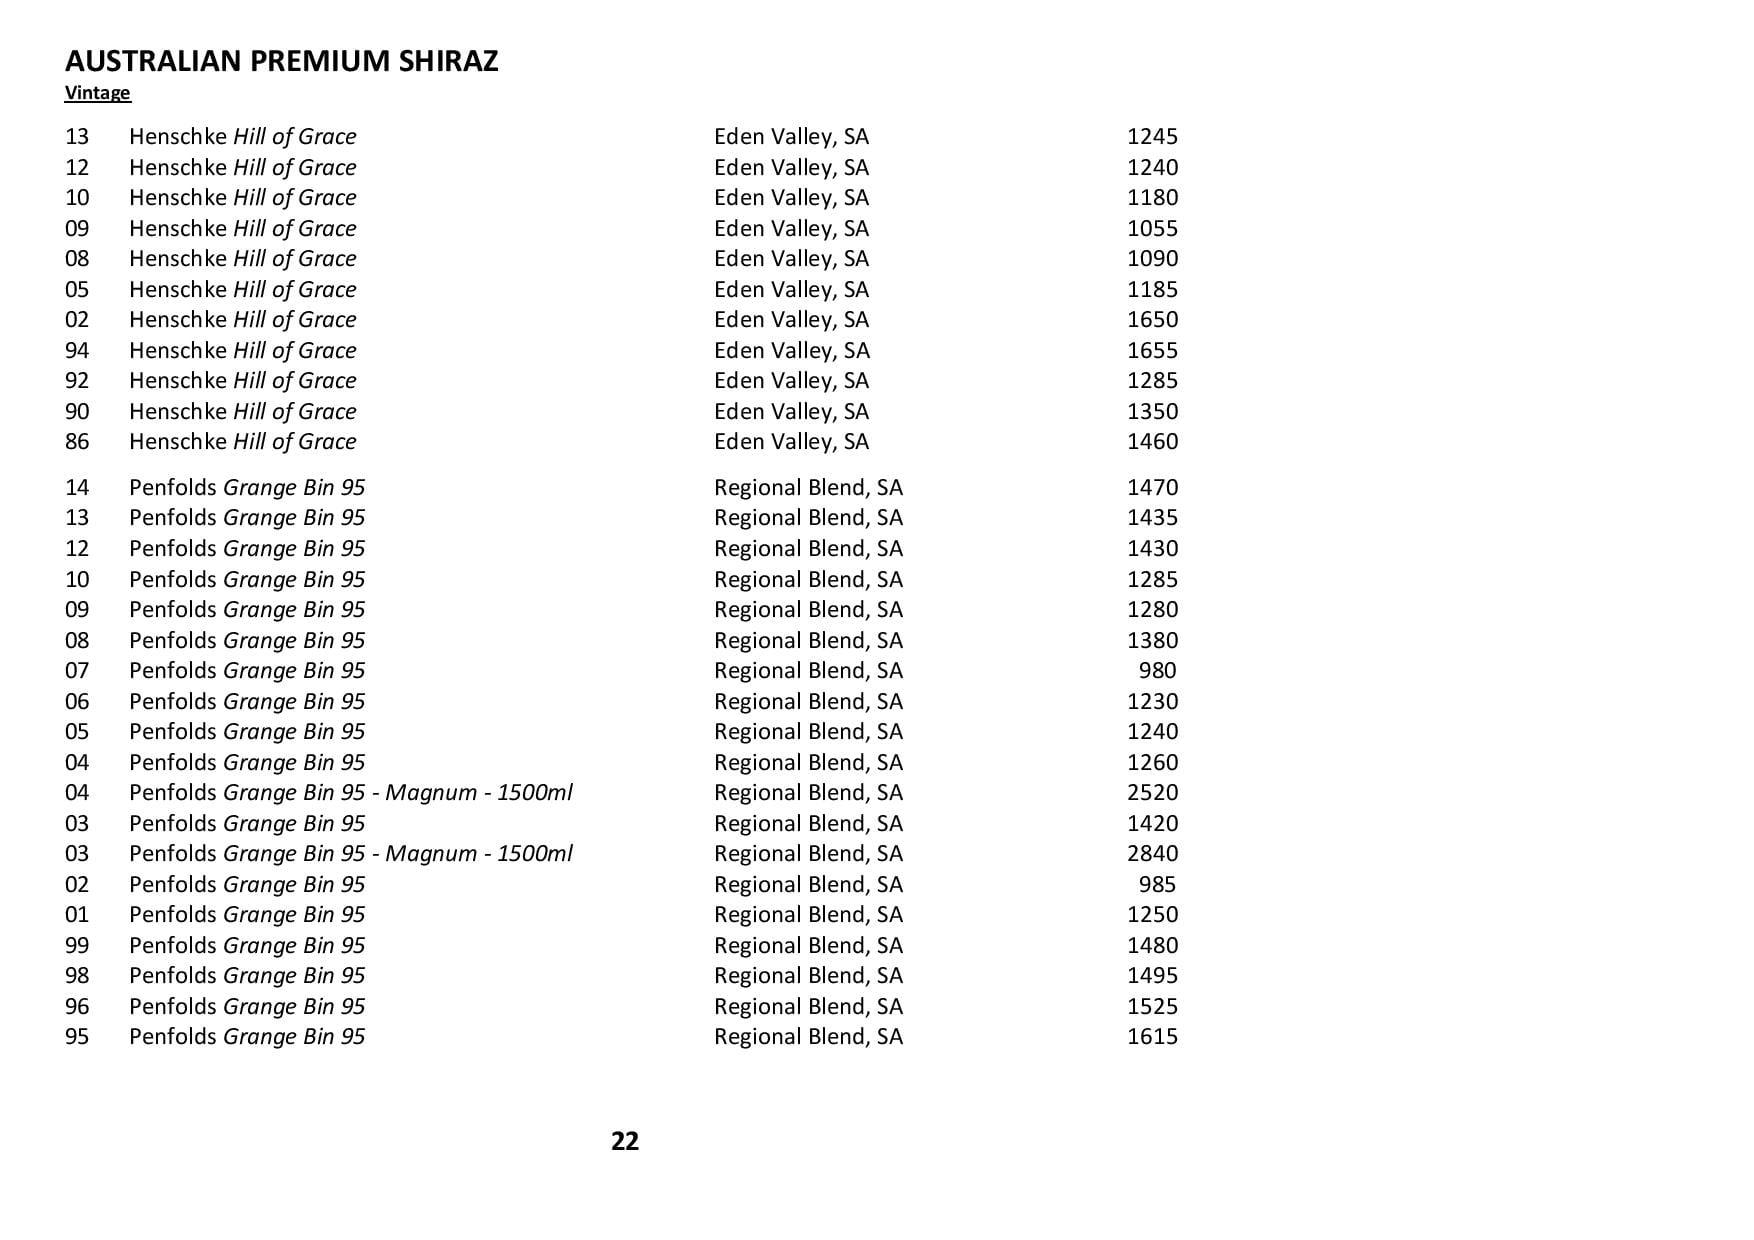 Sails Wine List 2020 Page 022